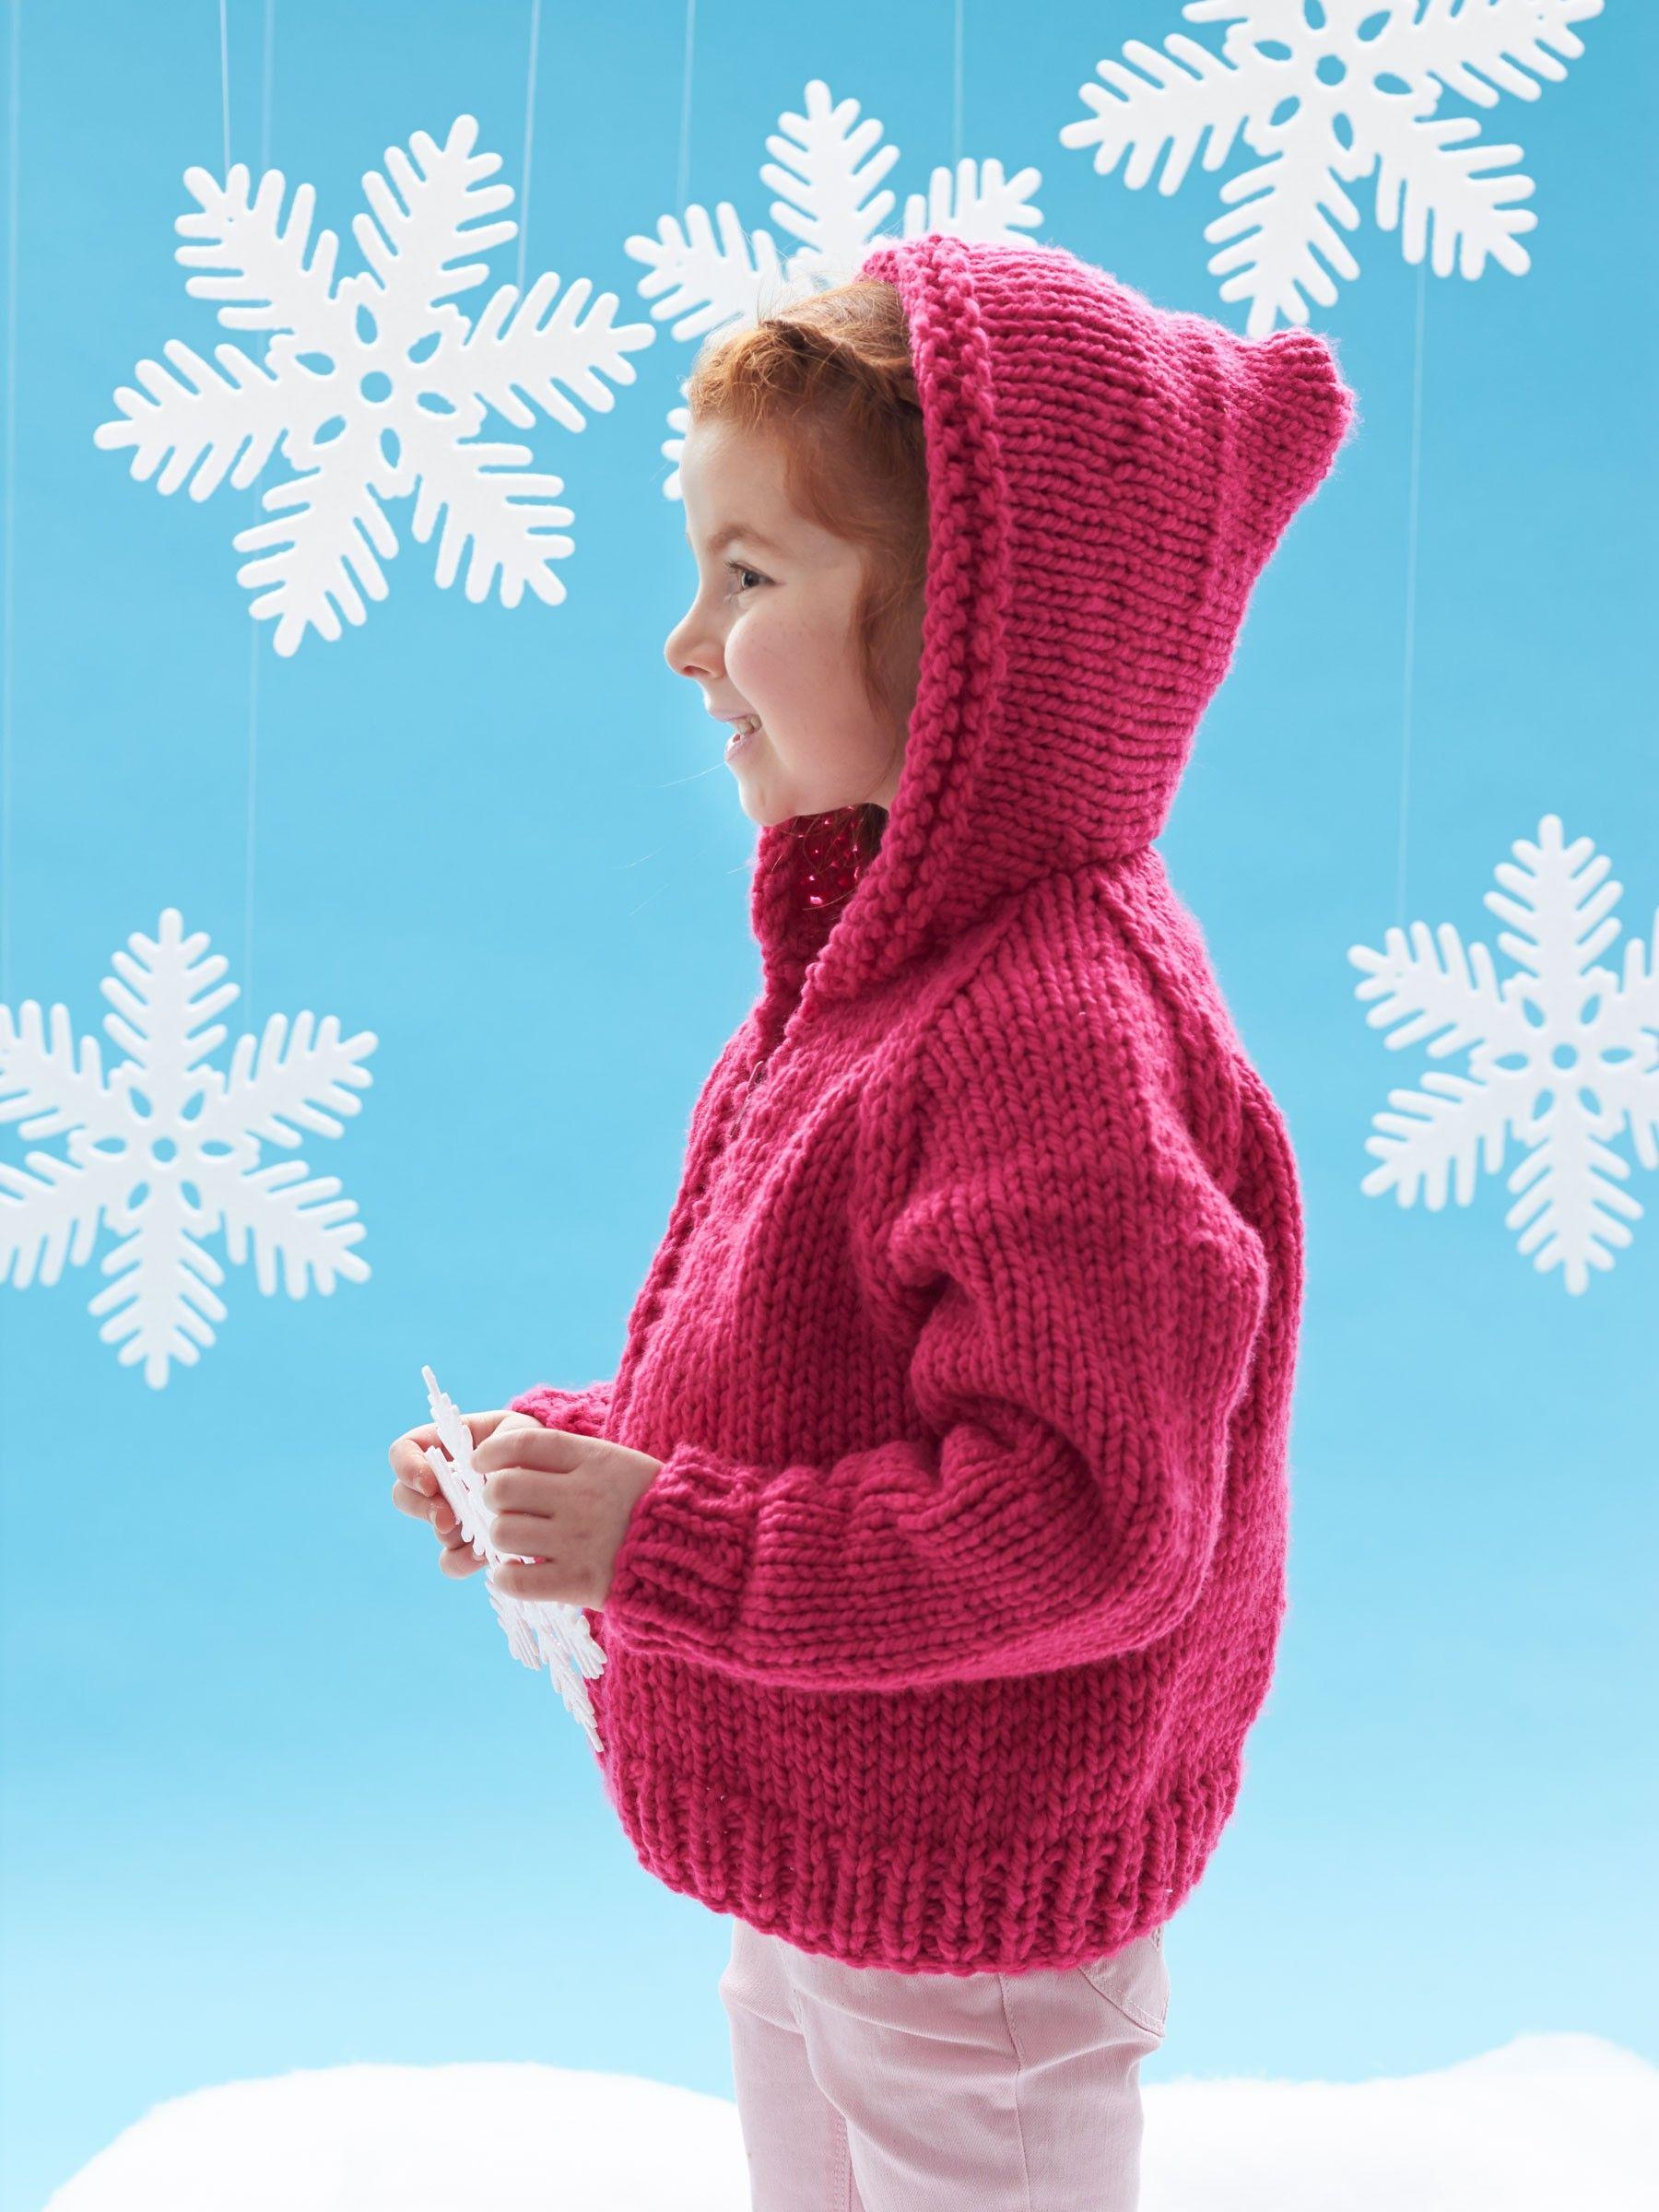 Kid's Jacket | Kids jackets pattern, Chunky knit sweater ...